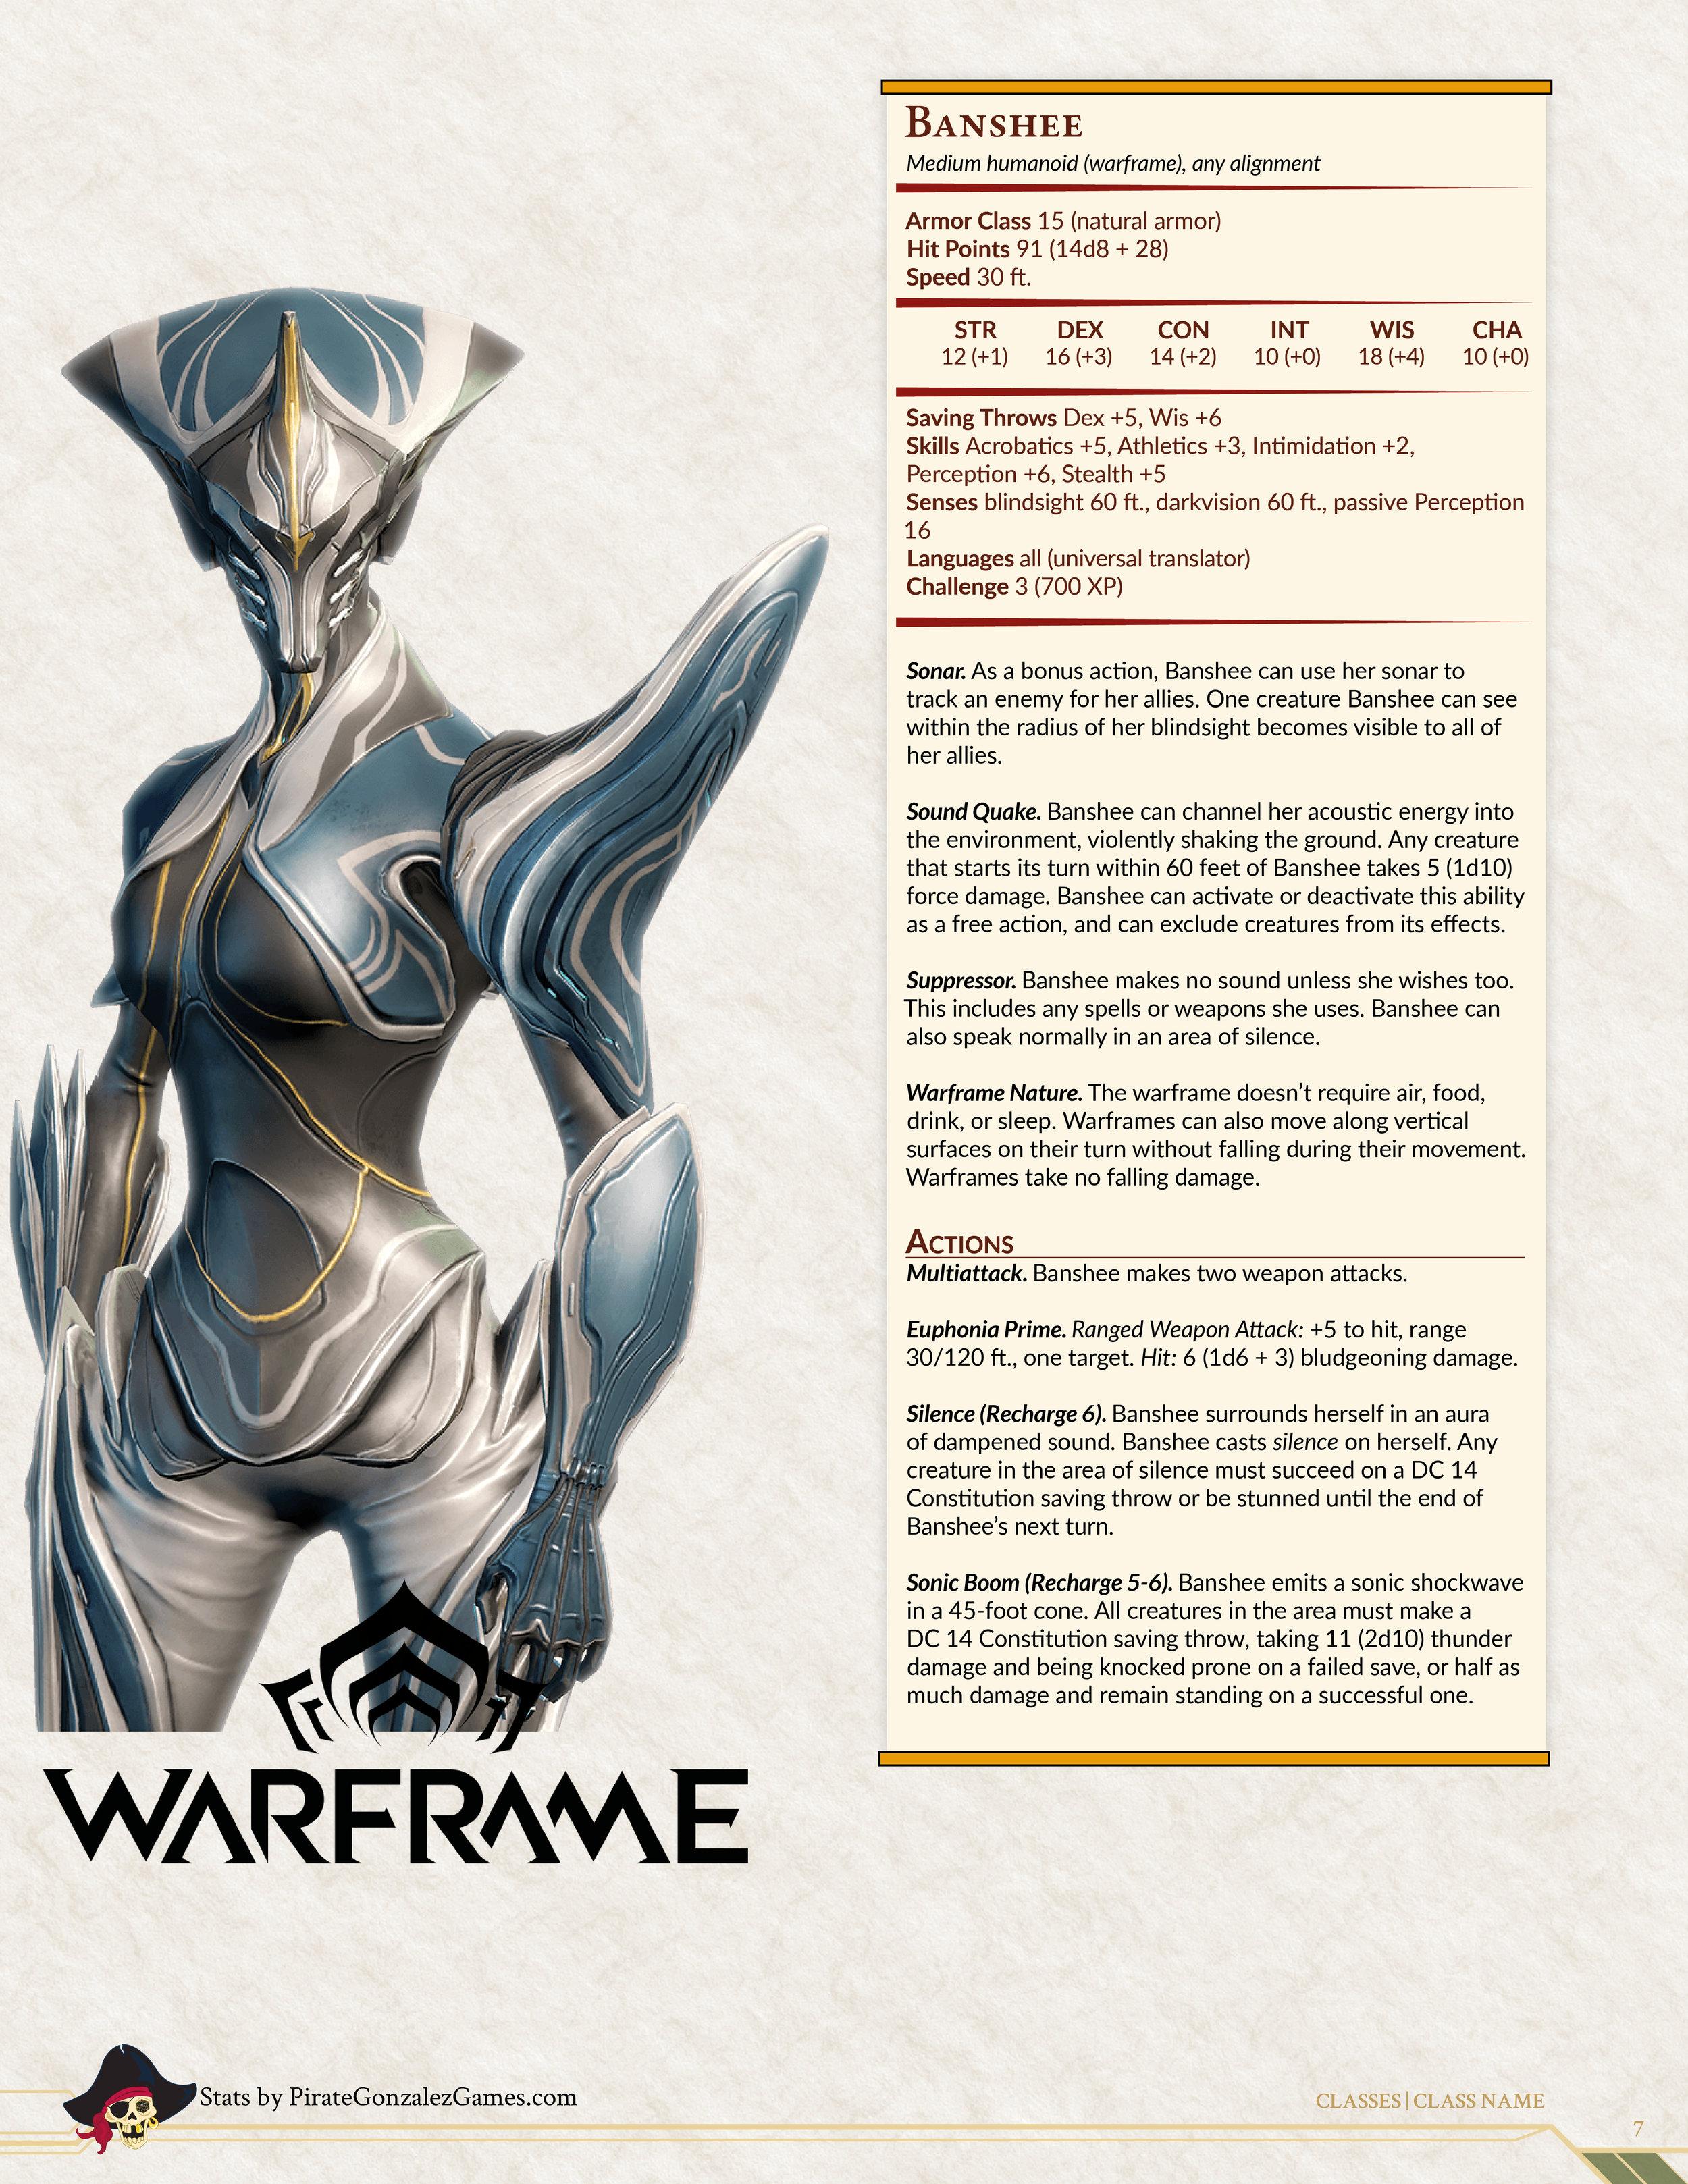 warframe3.jpg